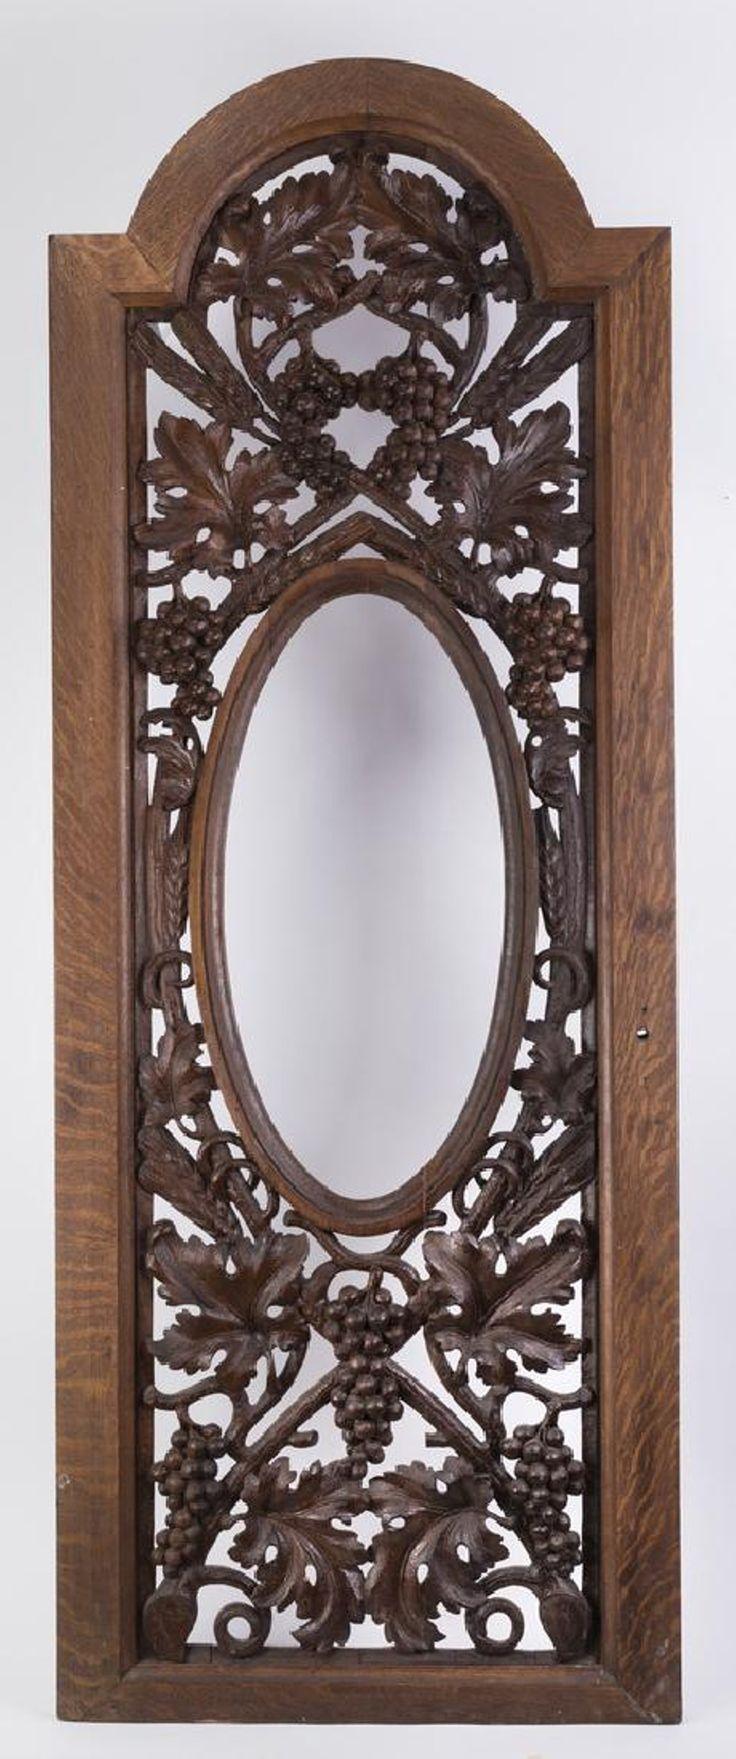 Carved oak architectural panel or wine cellar door